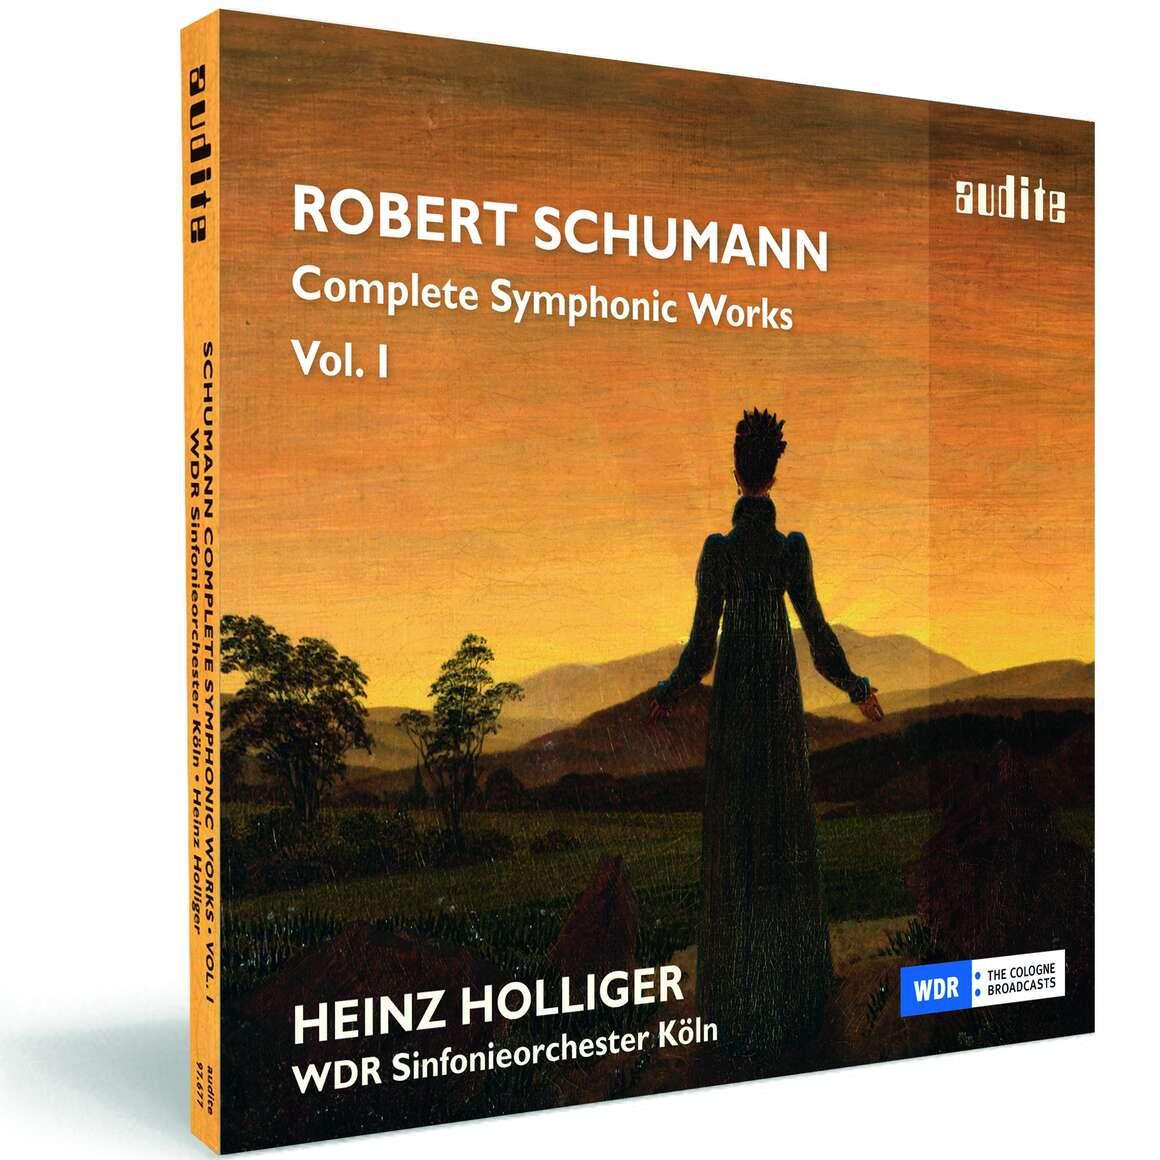 R. Schumann: Complete Symphonic Works, Vol. I